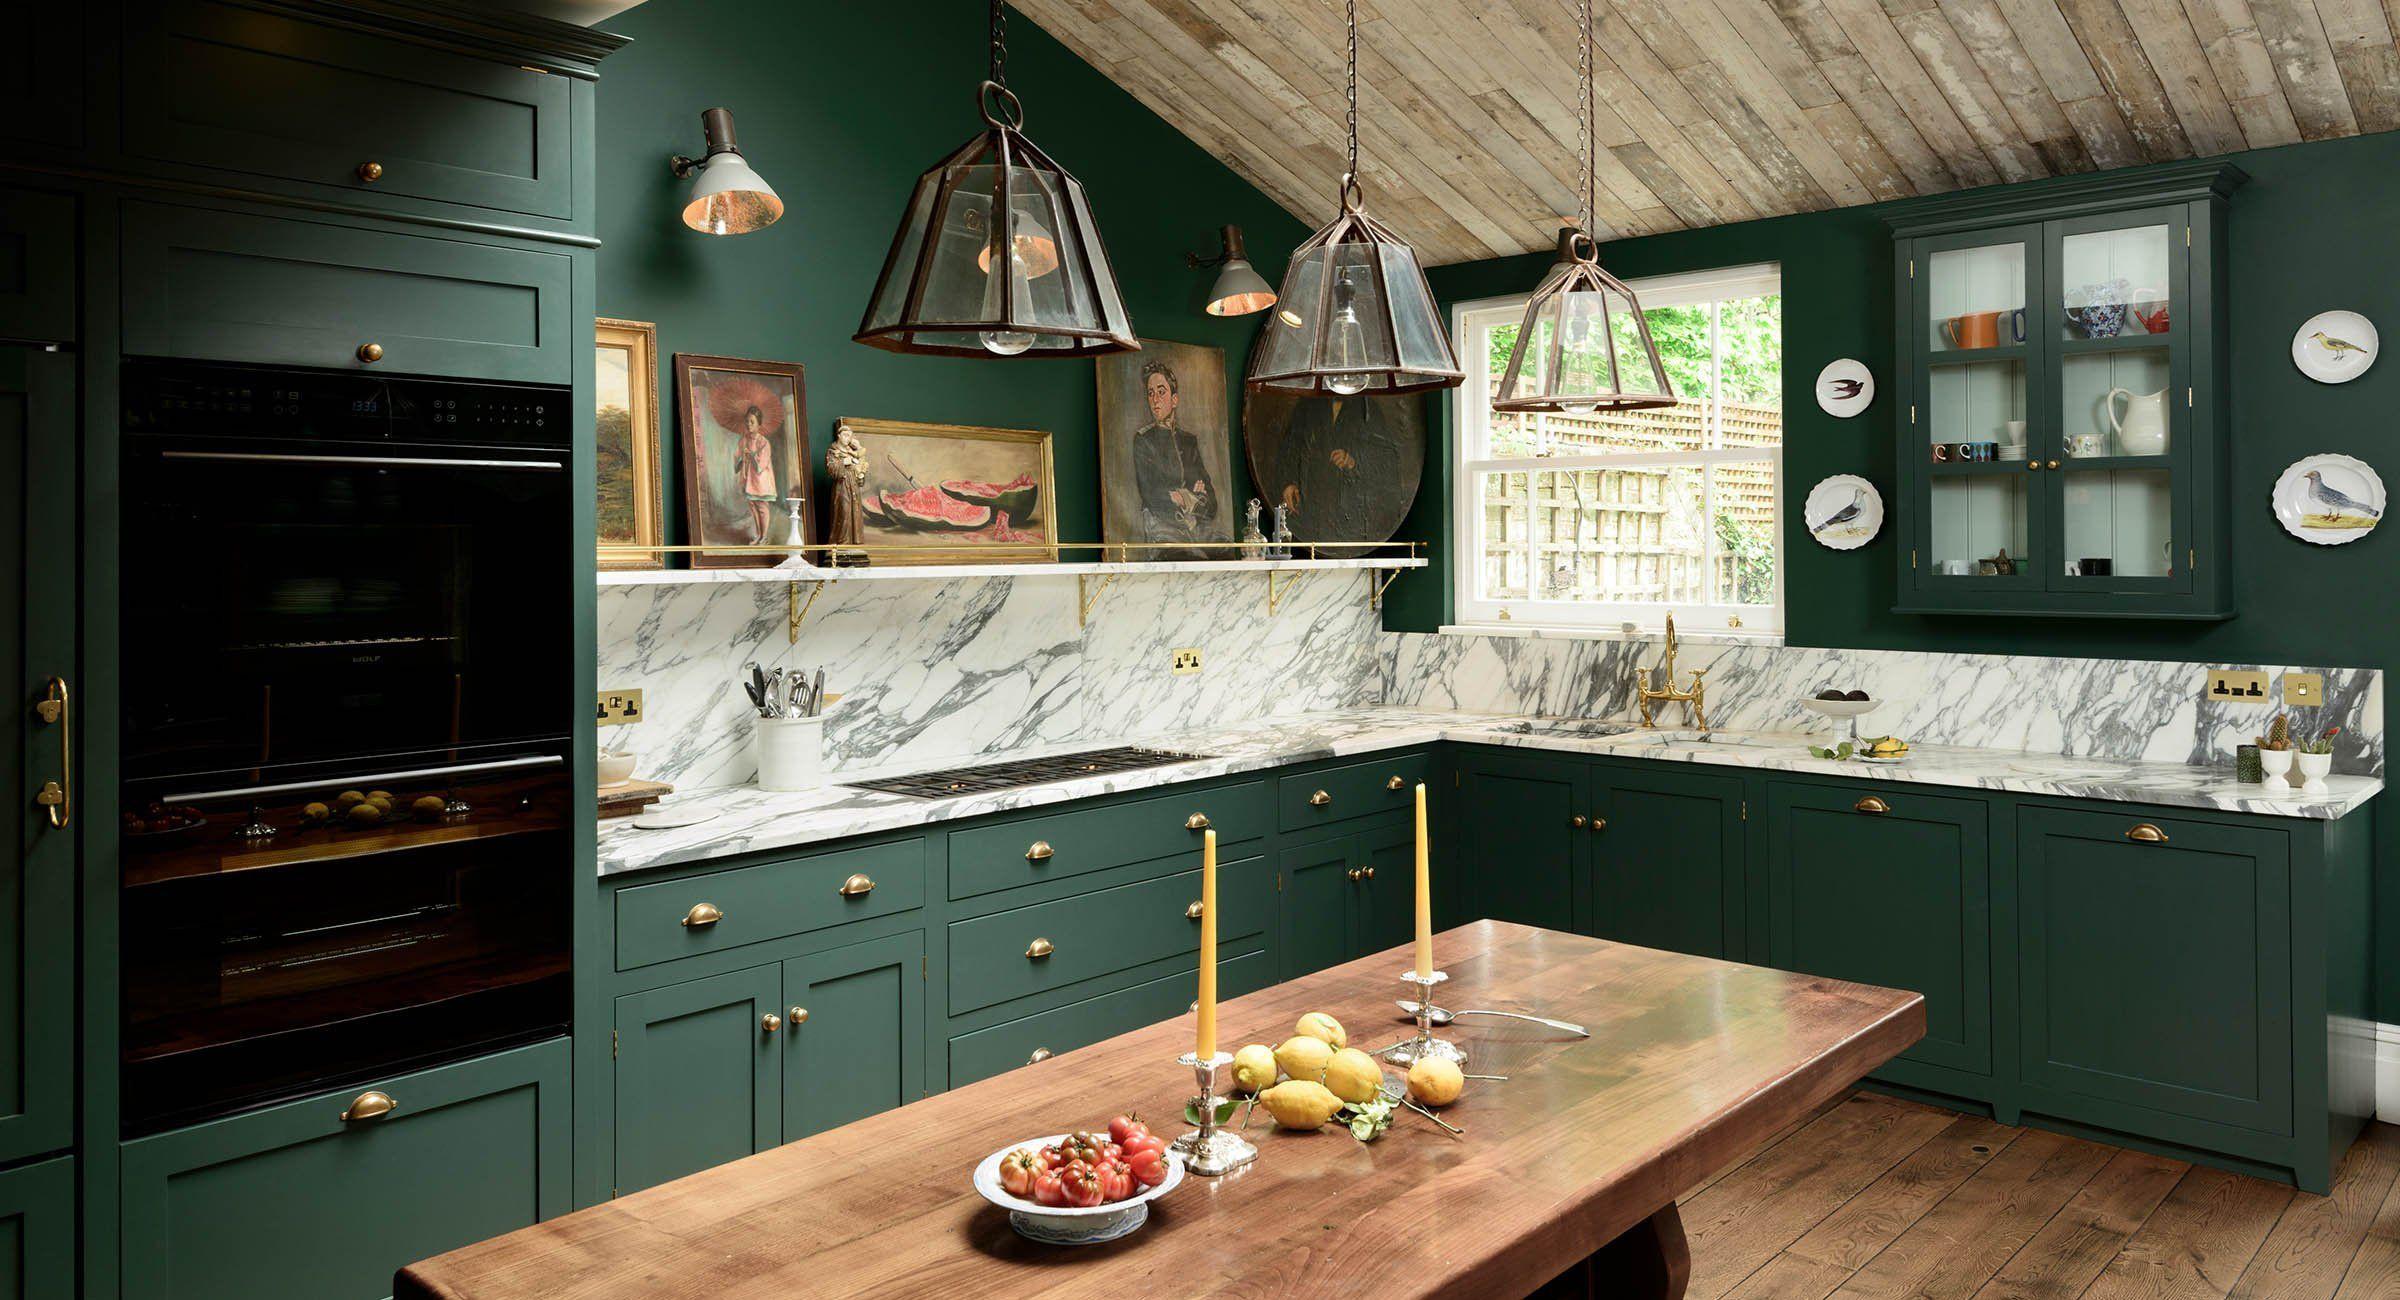 10 Alternative Kitchen Cabinet Colors Everyone S Loving In 2020 Green Kitchen Cabinets Kitchen Cabinet Design Interior Design Kitchen